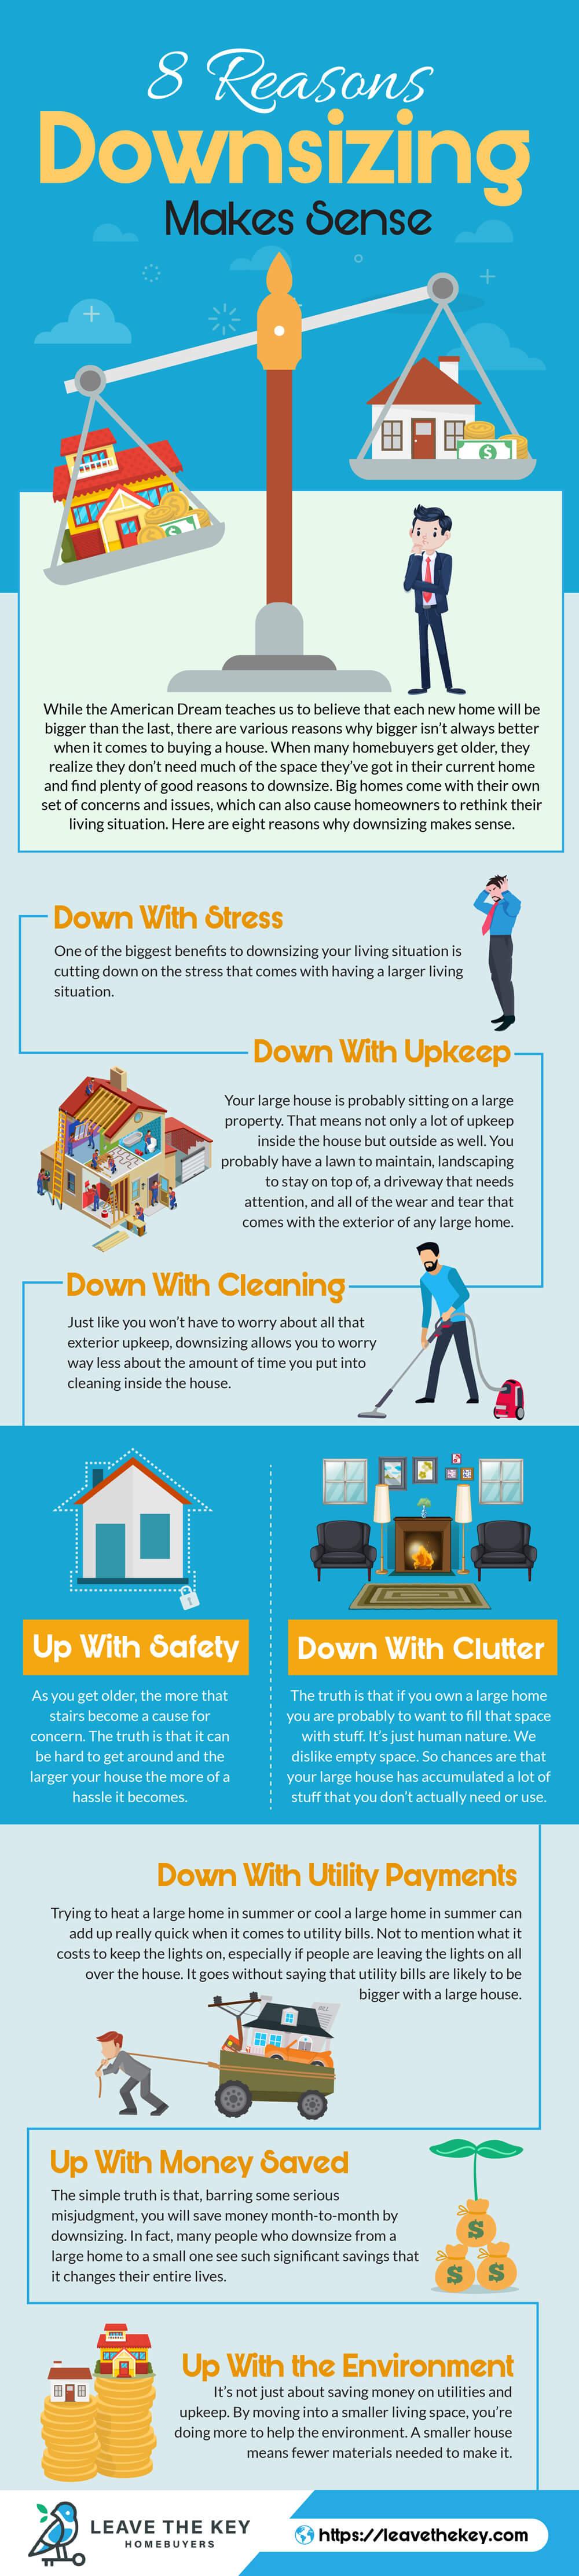 8-Reasons-Downsizing-Makes-Sense-infographic-plaza